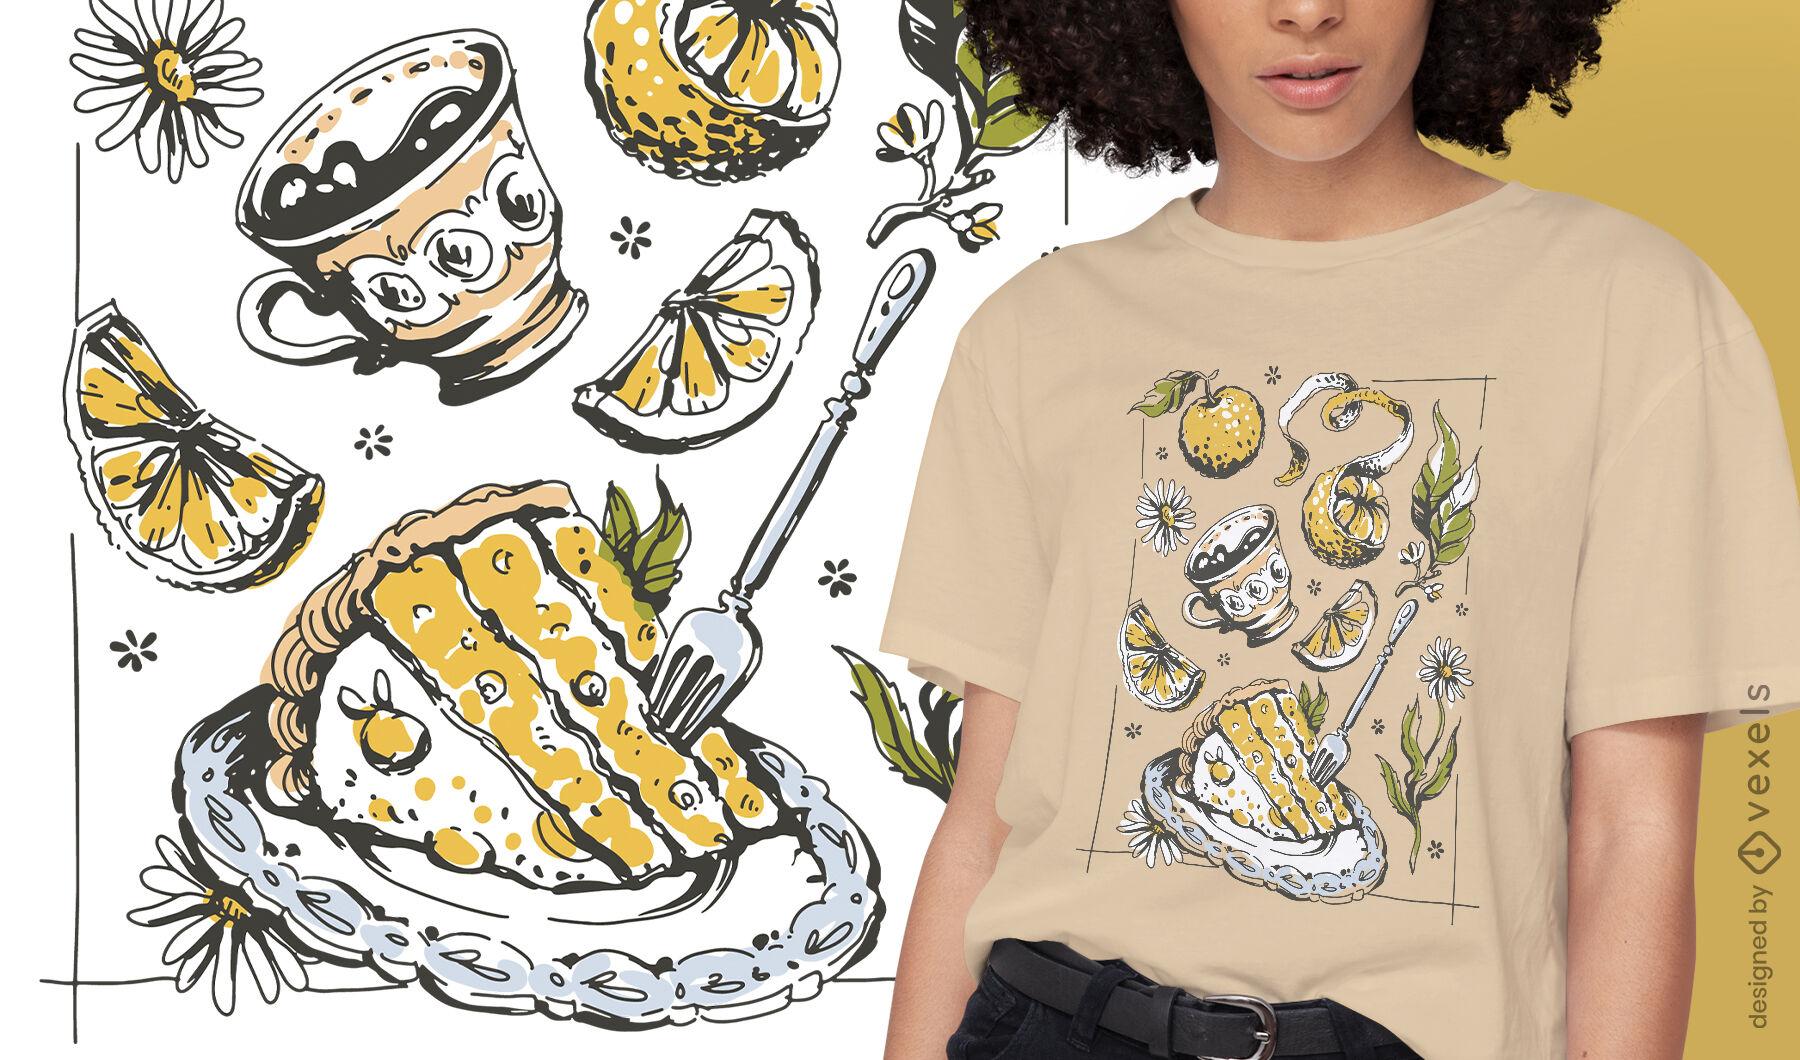 Diseño de camiseta de estilo de vida de Cottagecore.